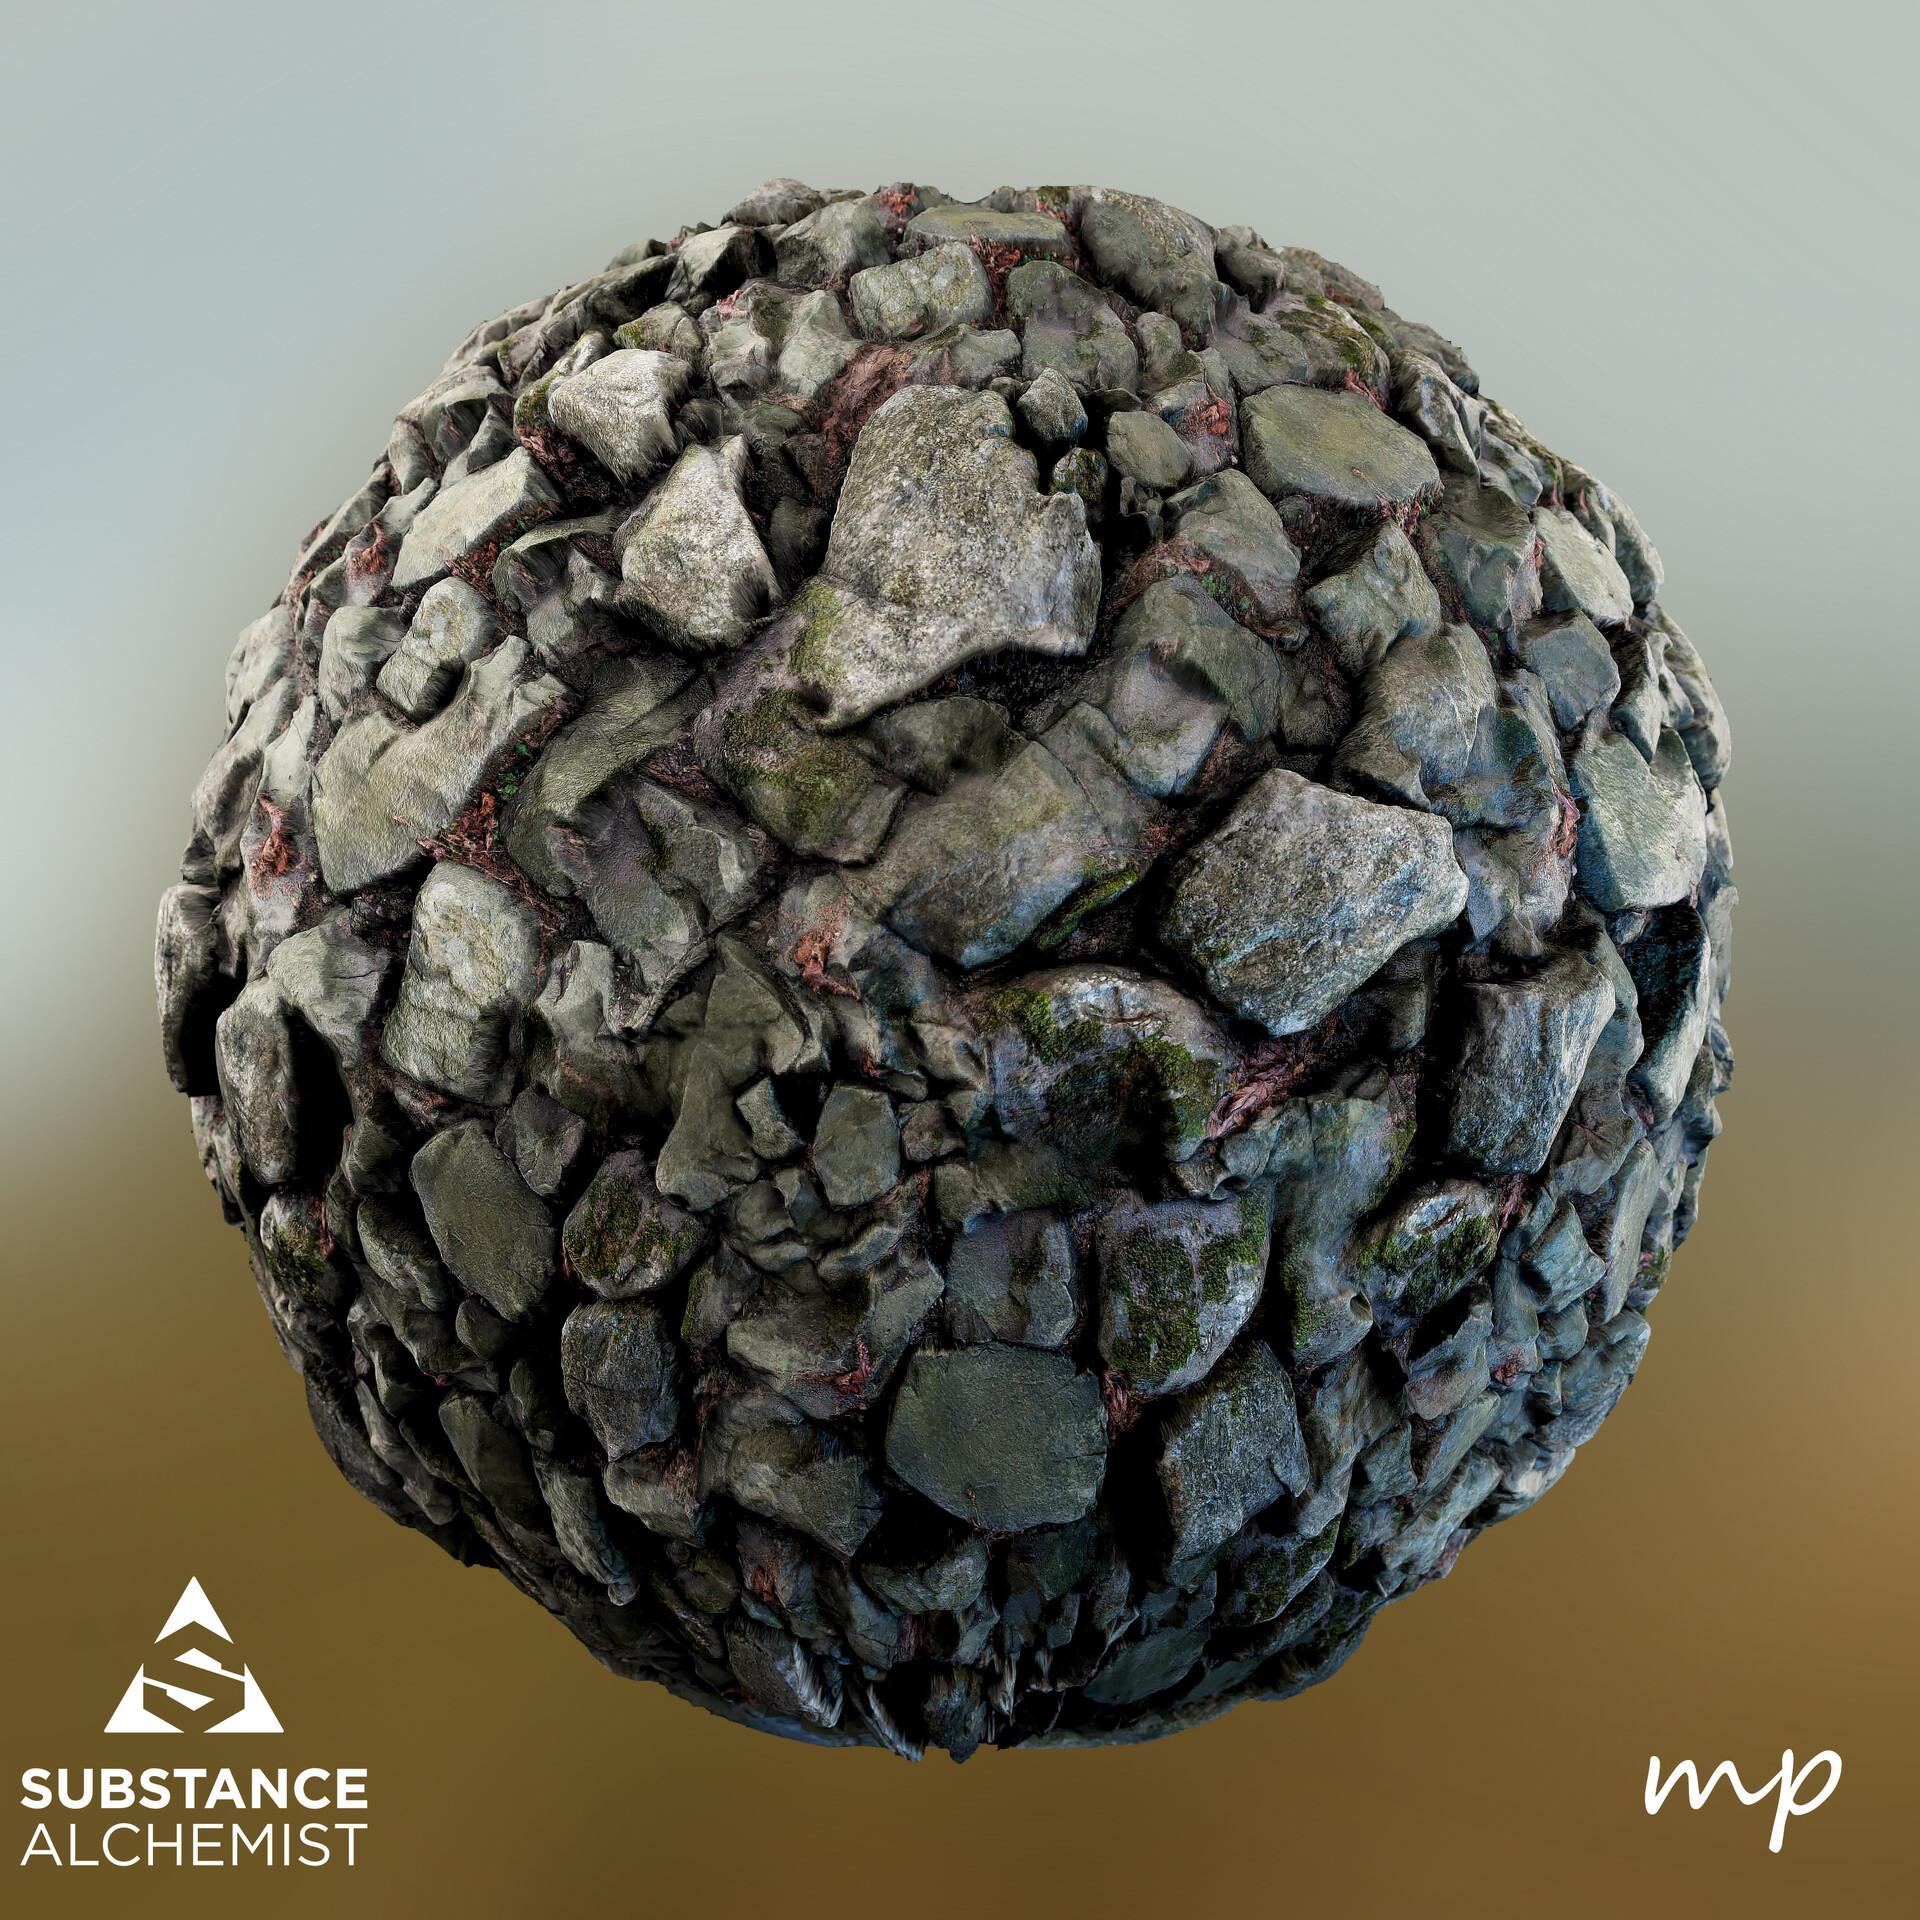 Martin pietras photogrammetry rocks sphere 01